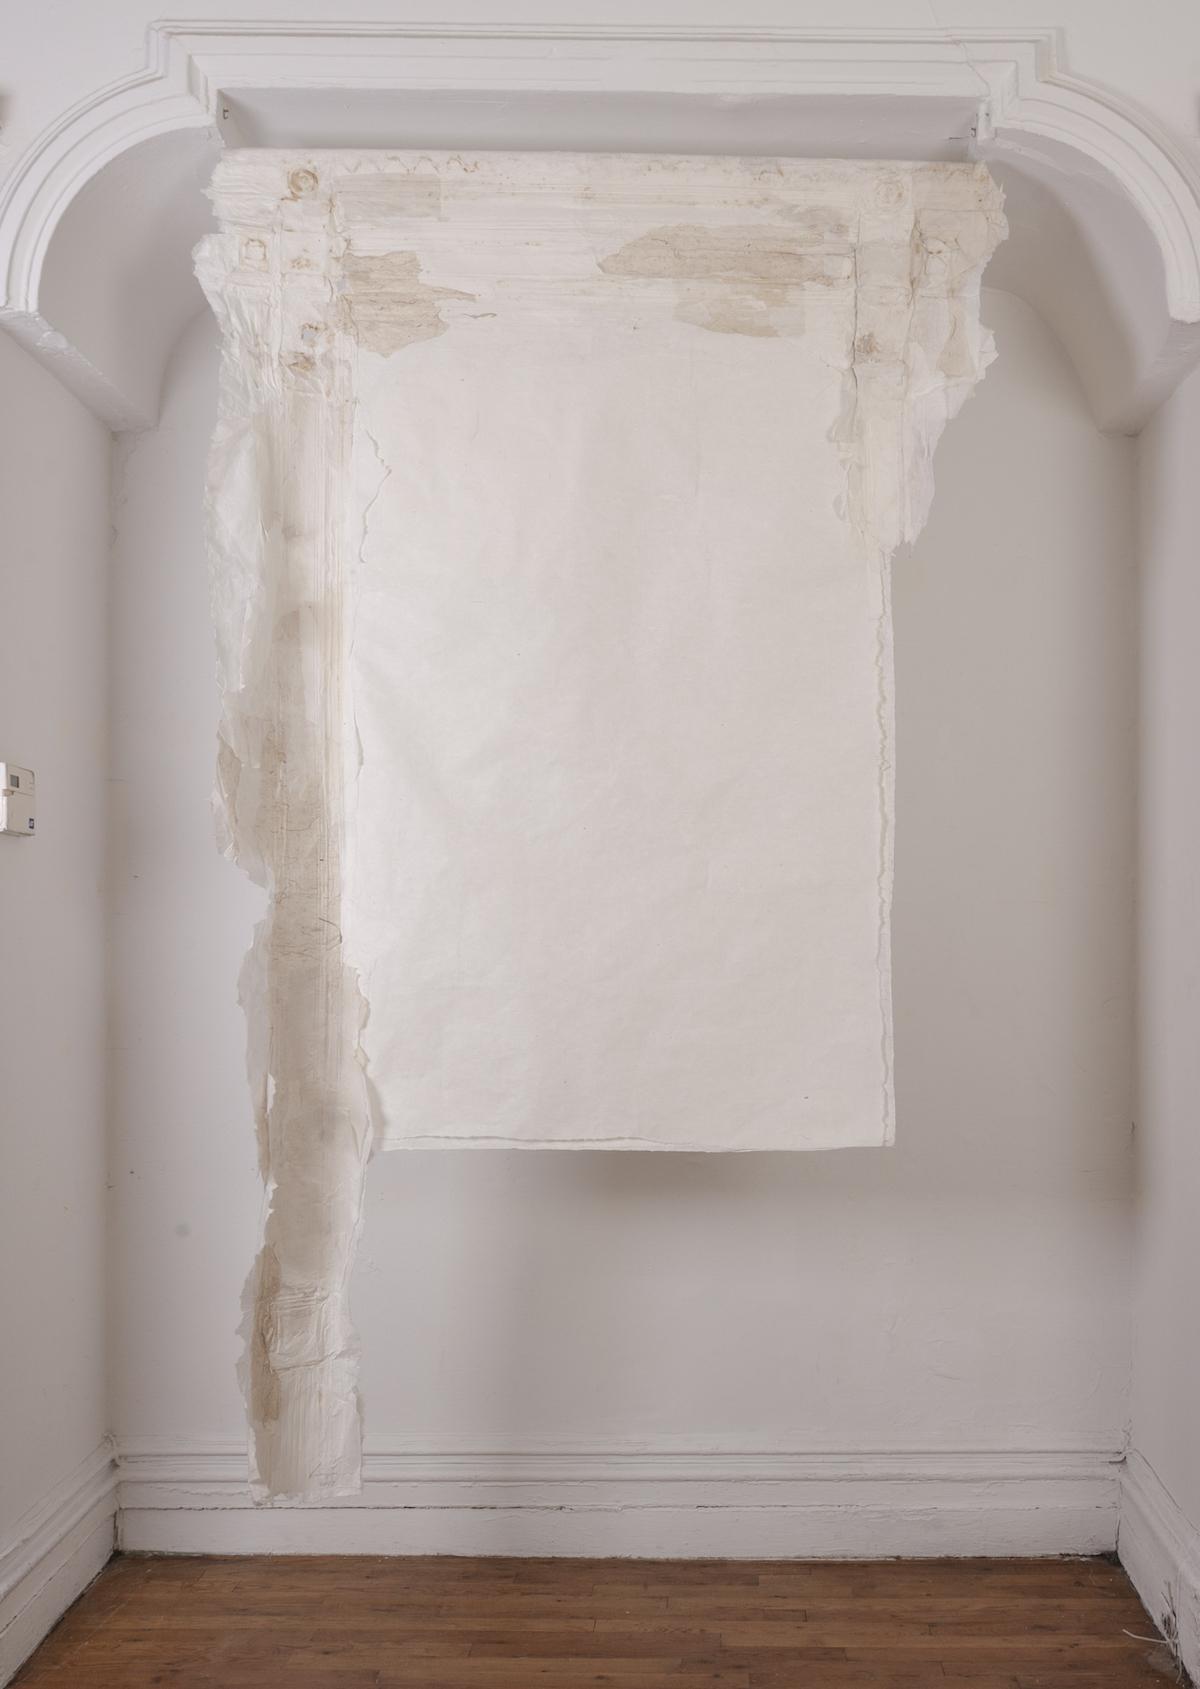 Lin Yan,  Borrowed Scenery  取景, 2017. Xuan paper. 91 x 48 in. (231 x 123 cm) ©2017 Lin Yan, Courtesy Fou Gallery